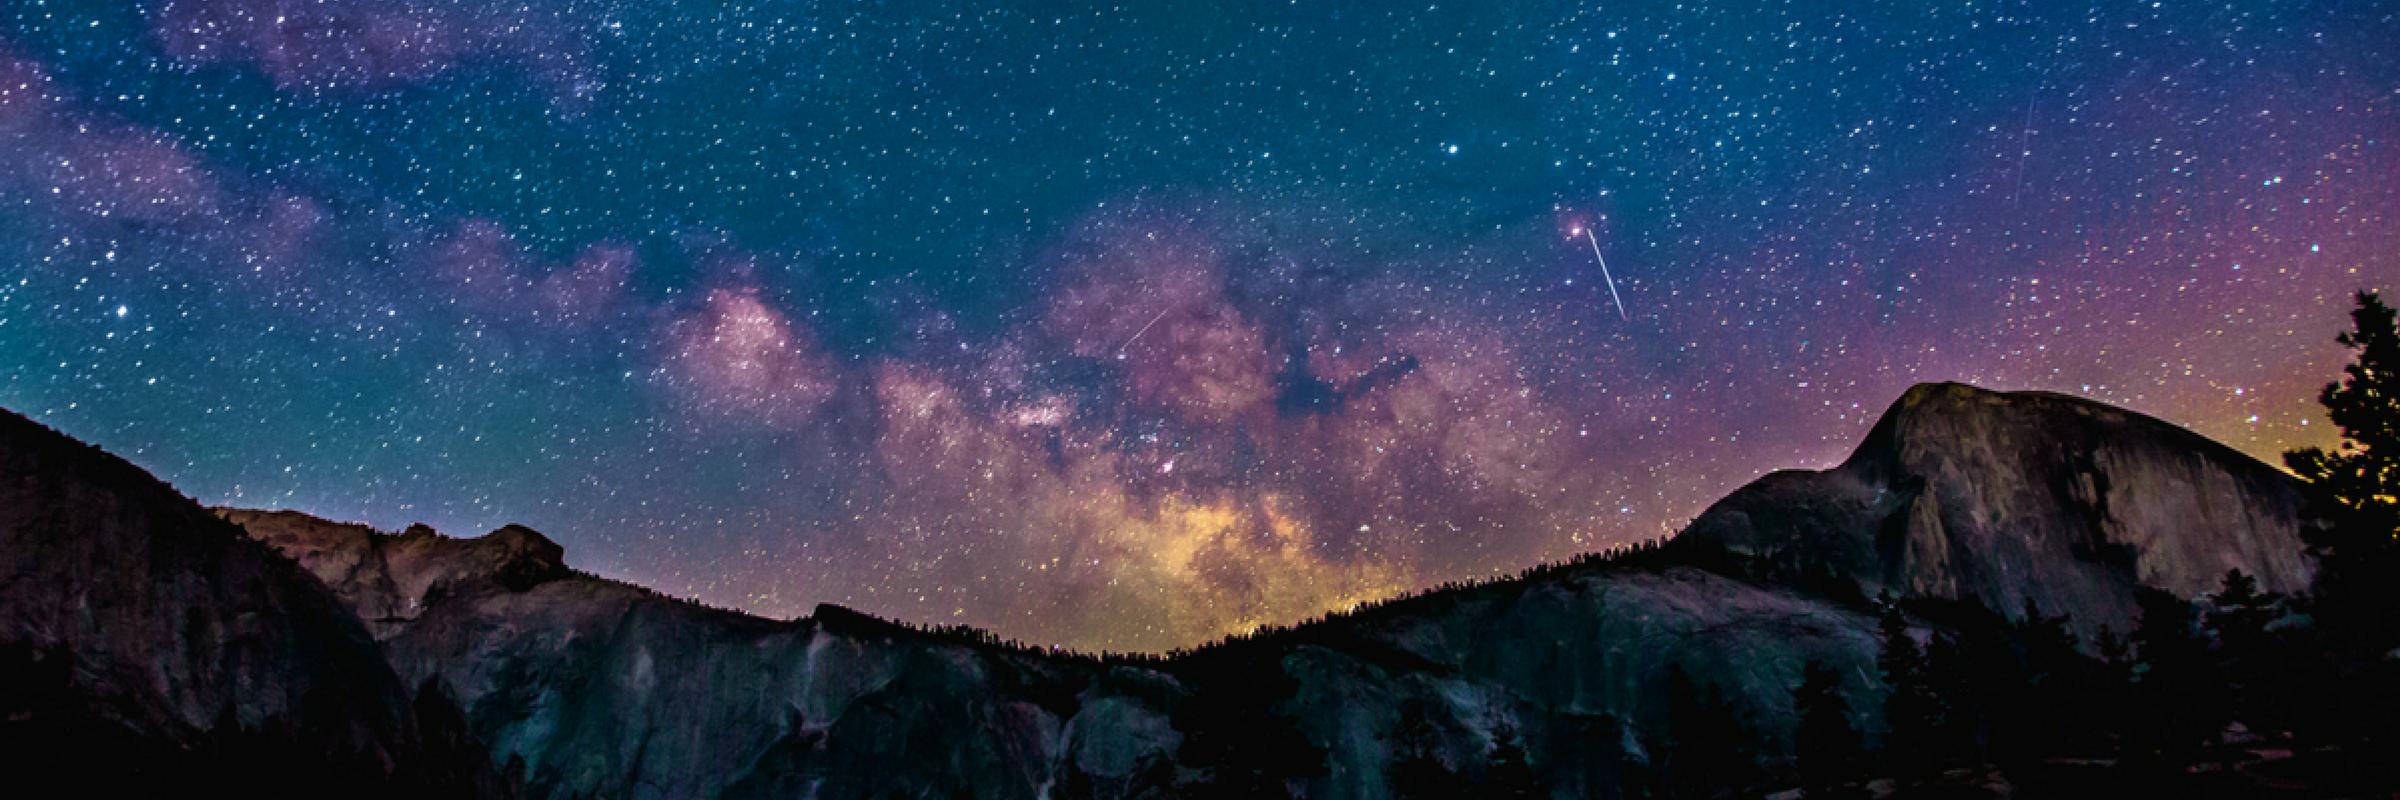 Starry Sky Slider Image